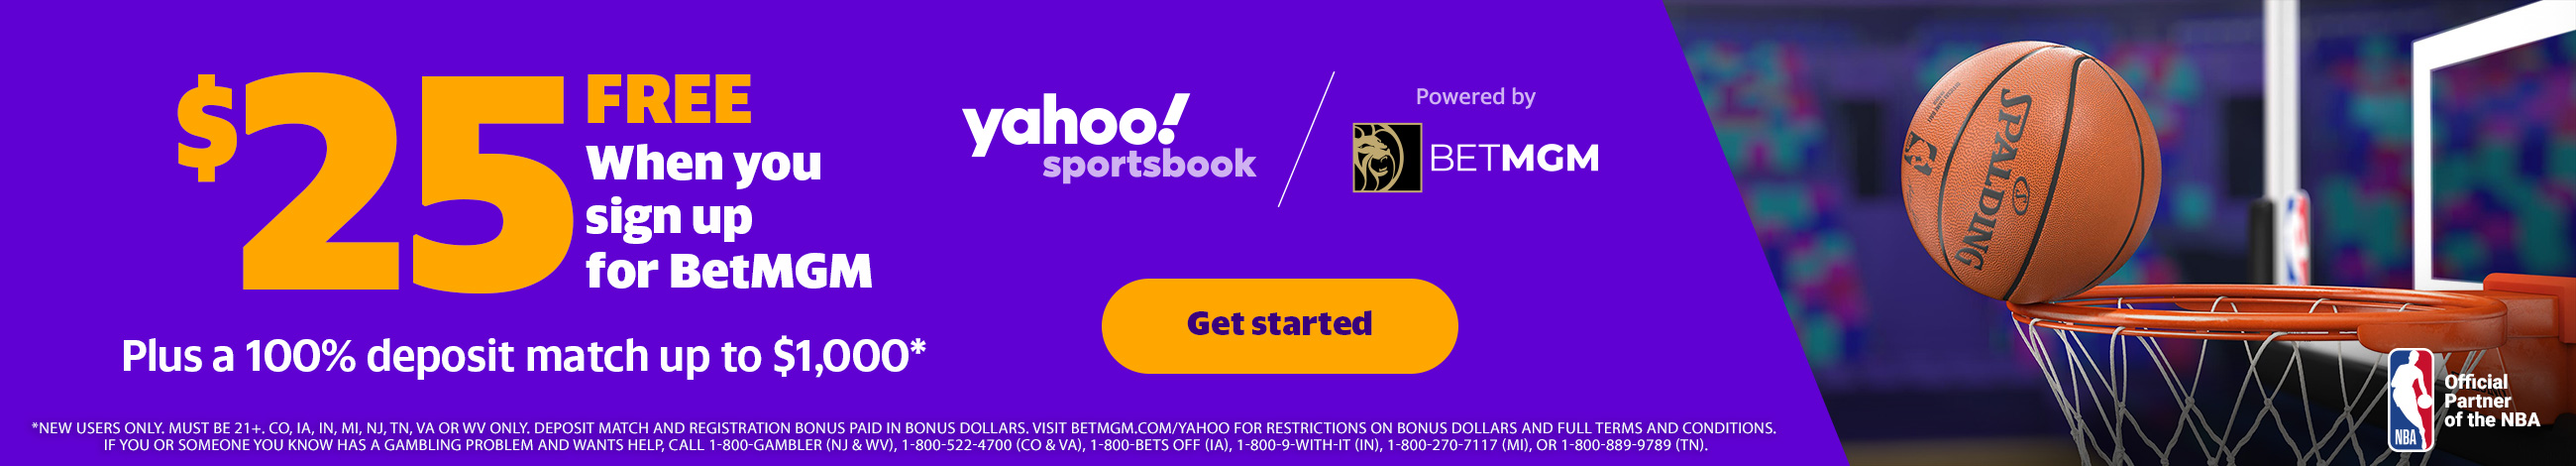 Sportsbook Promotion